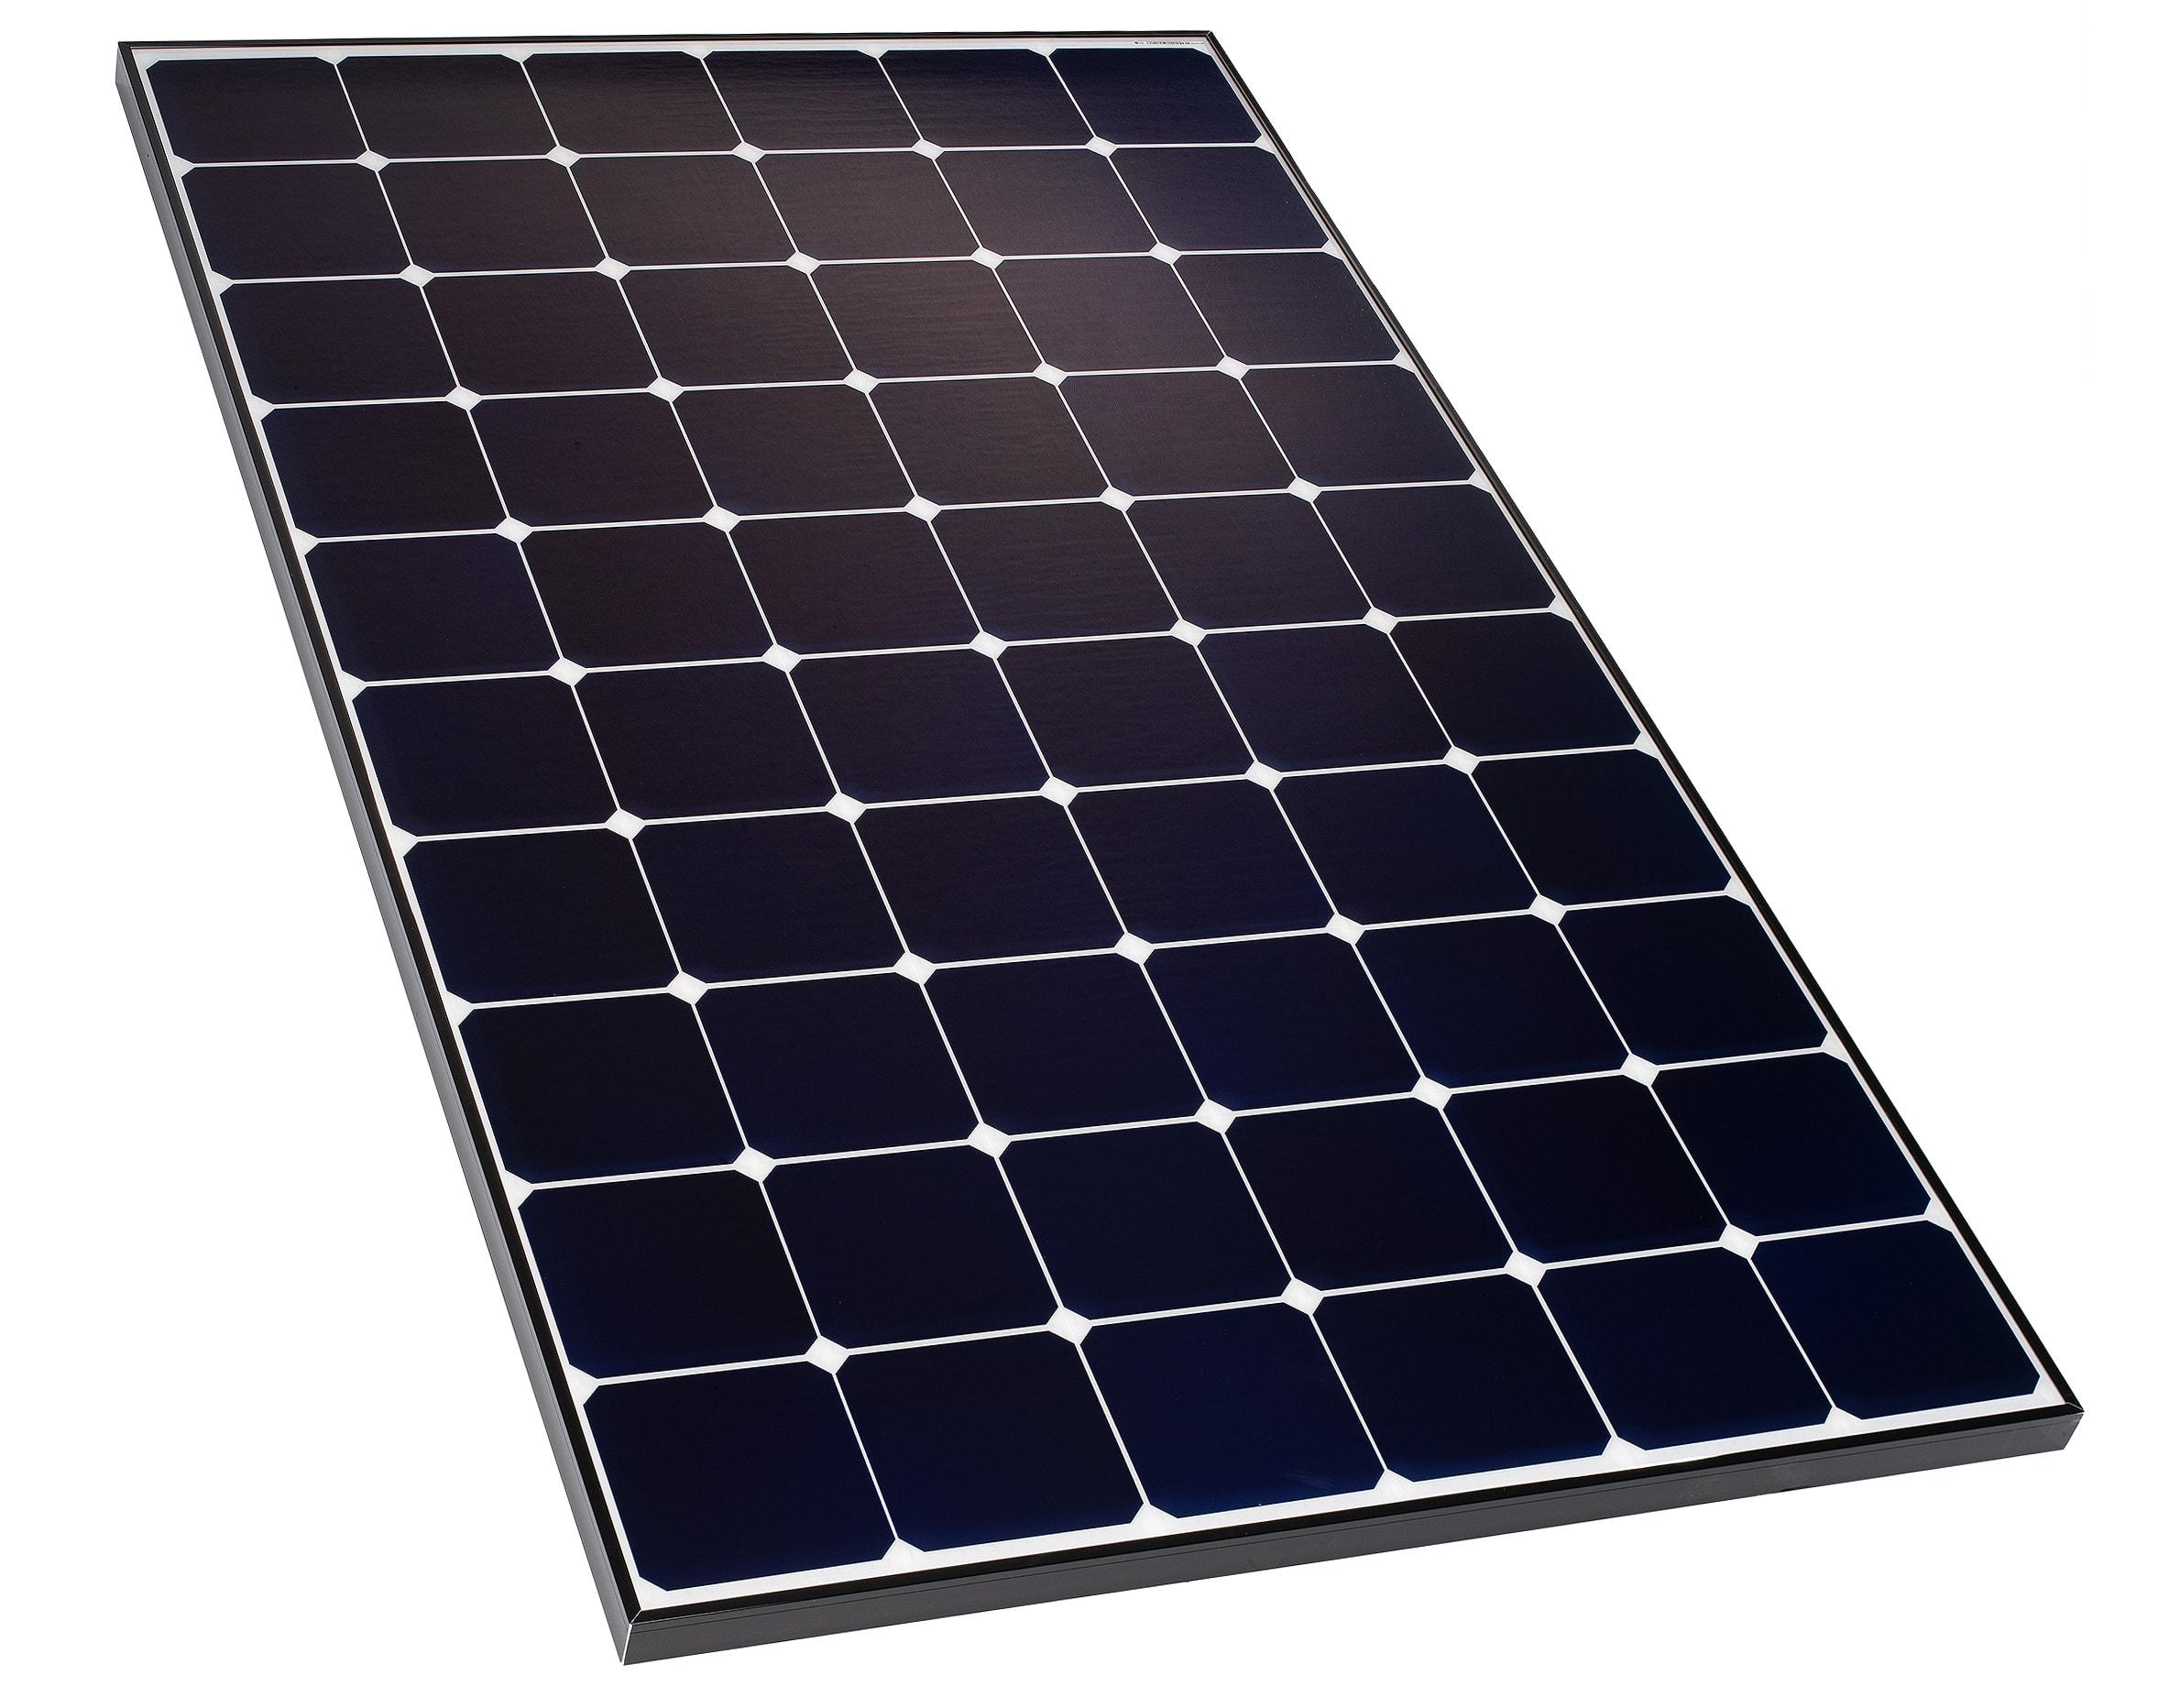 Mvdm Lg Neon 360wp Full, uw zonnepanelen Specialist